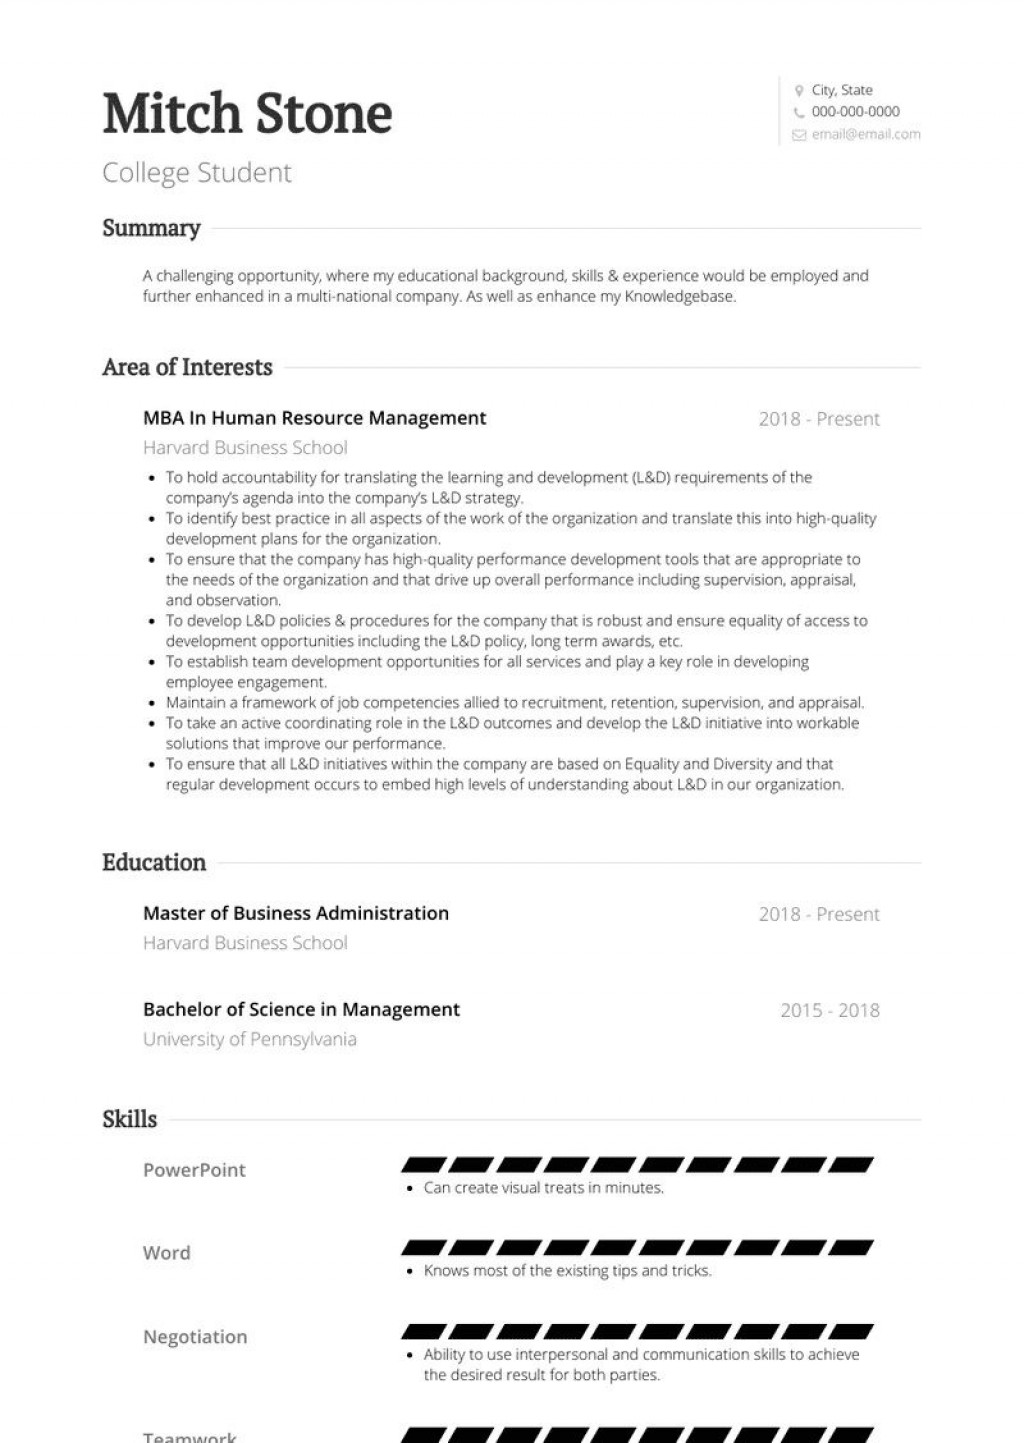 004 Striking Basic Student Resume Template High Def  Templates School Google DocLarge